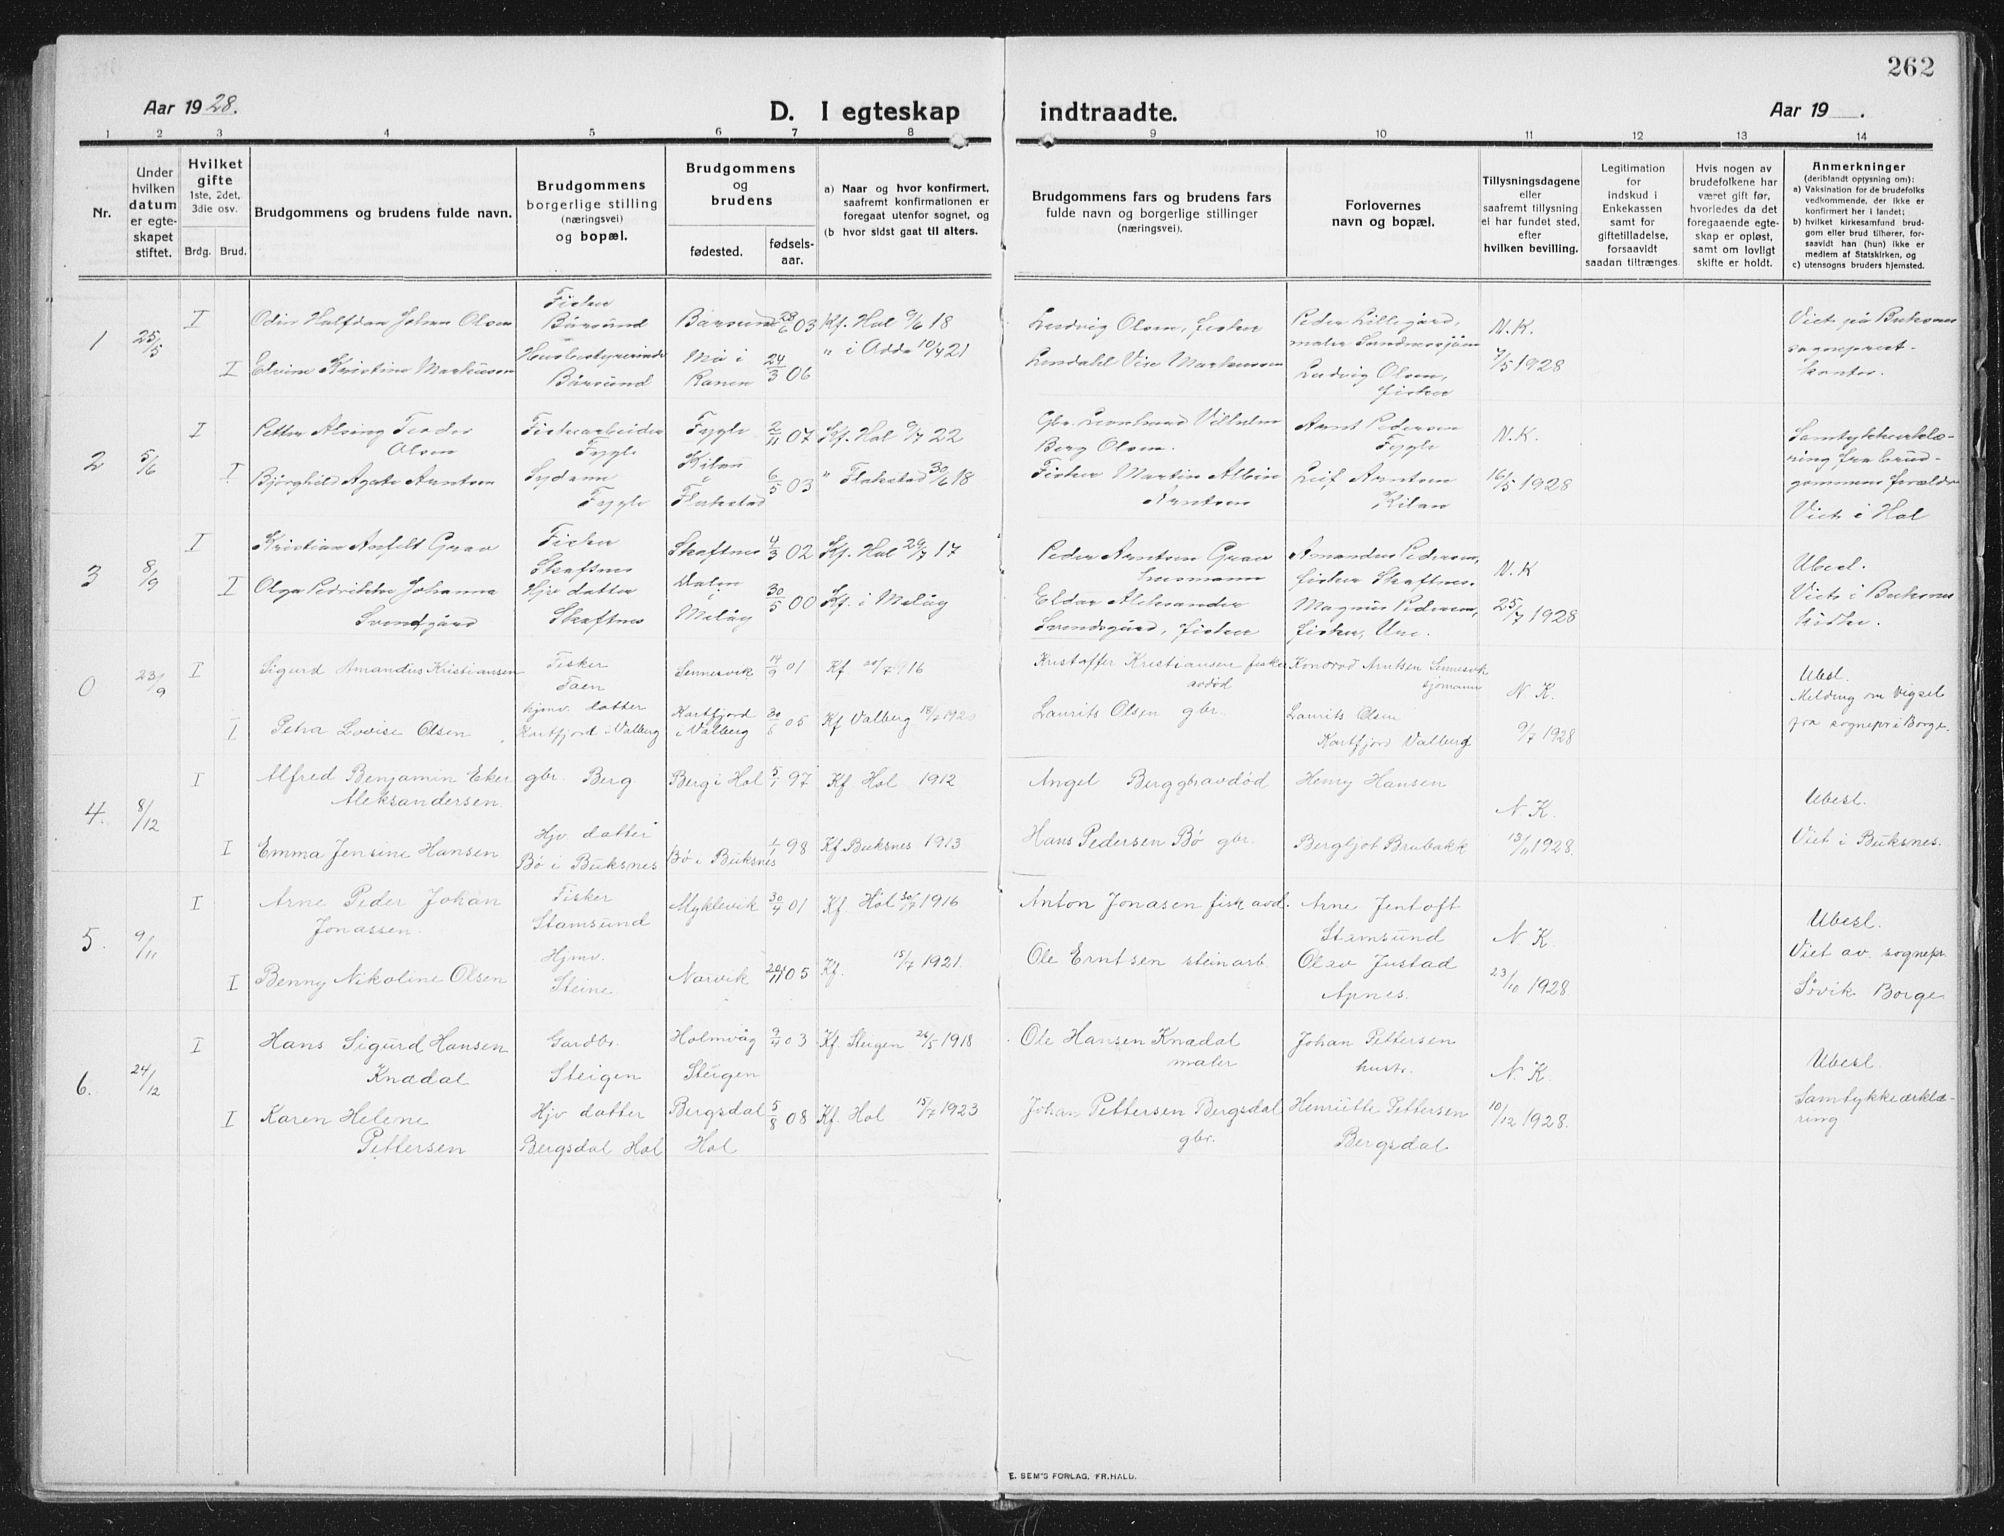 SAT, Ministerialprotokoller, klokkerbøker og fødselsregistre - Nordland, 882/L1183: Klokkerbok nr. 882C01, 1911-1938, s. 262